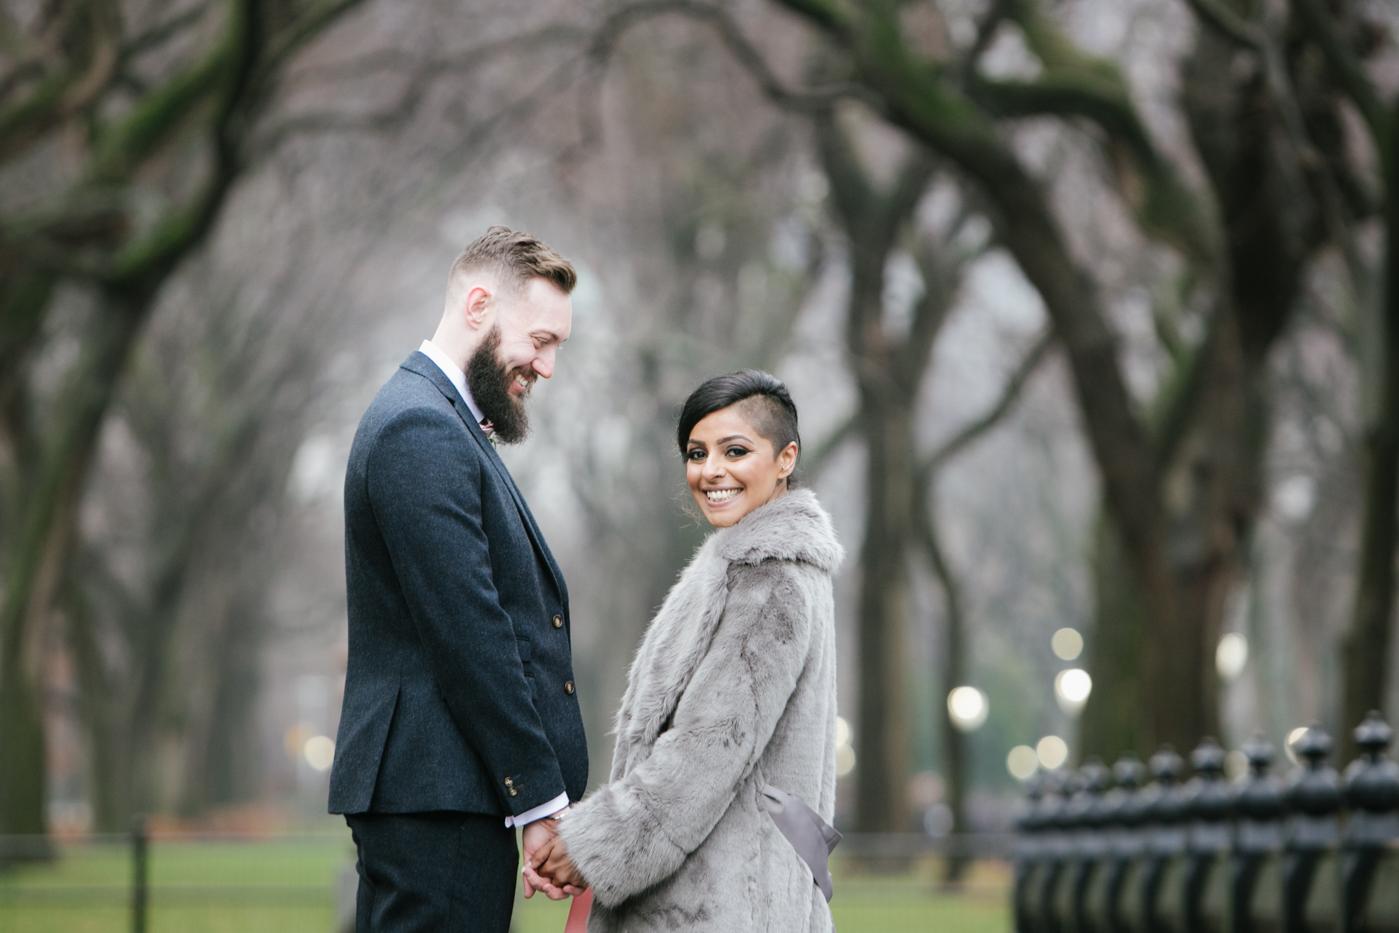 Central-park-wedding-by-Tanya-Isaeva-110.jpg